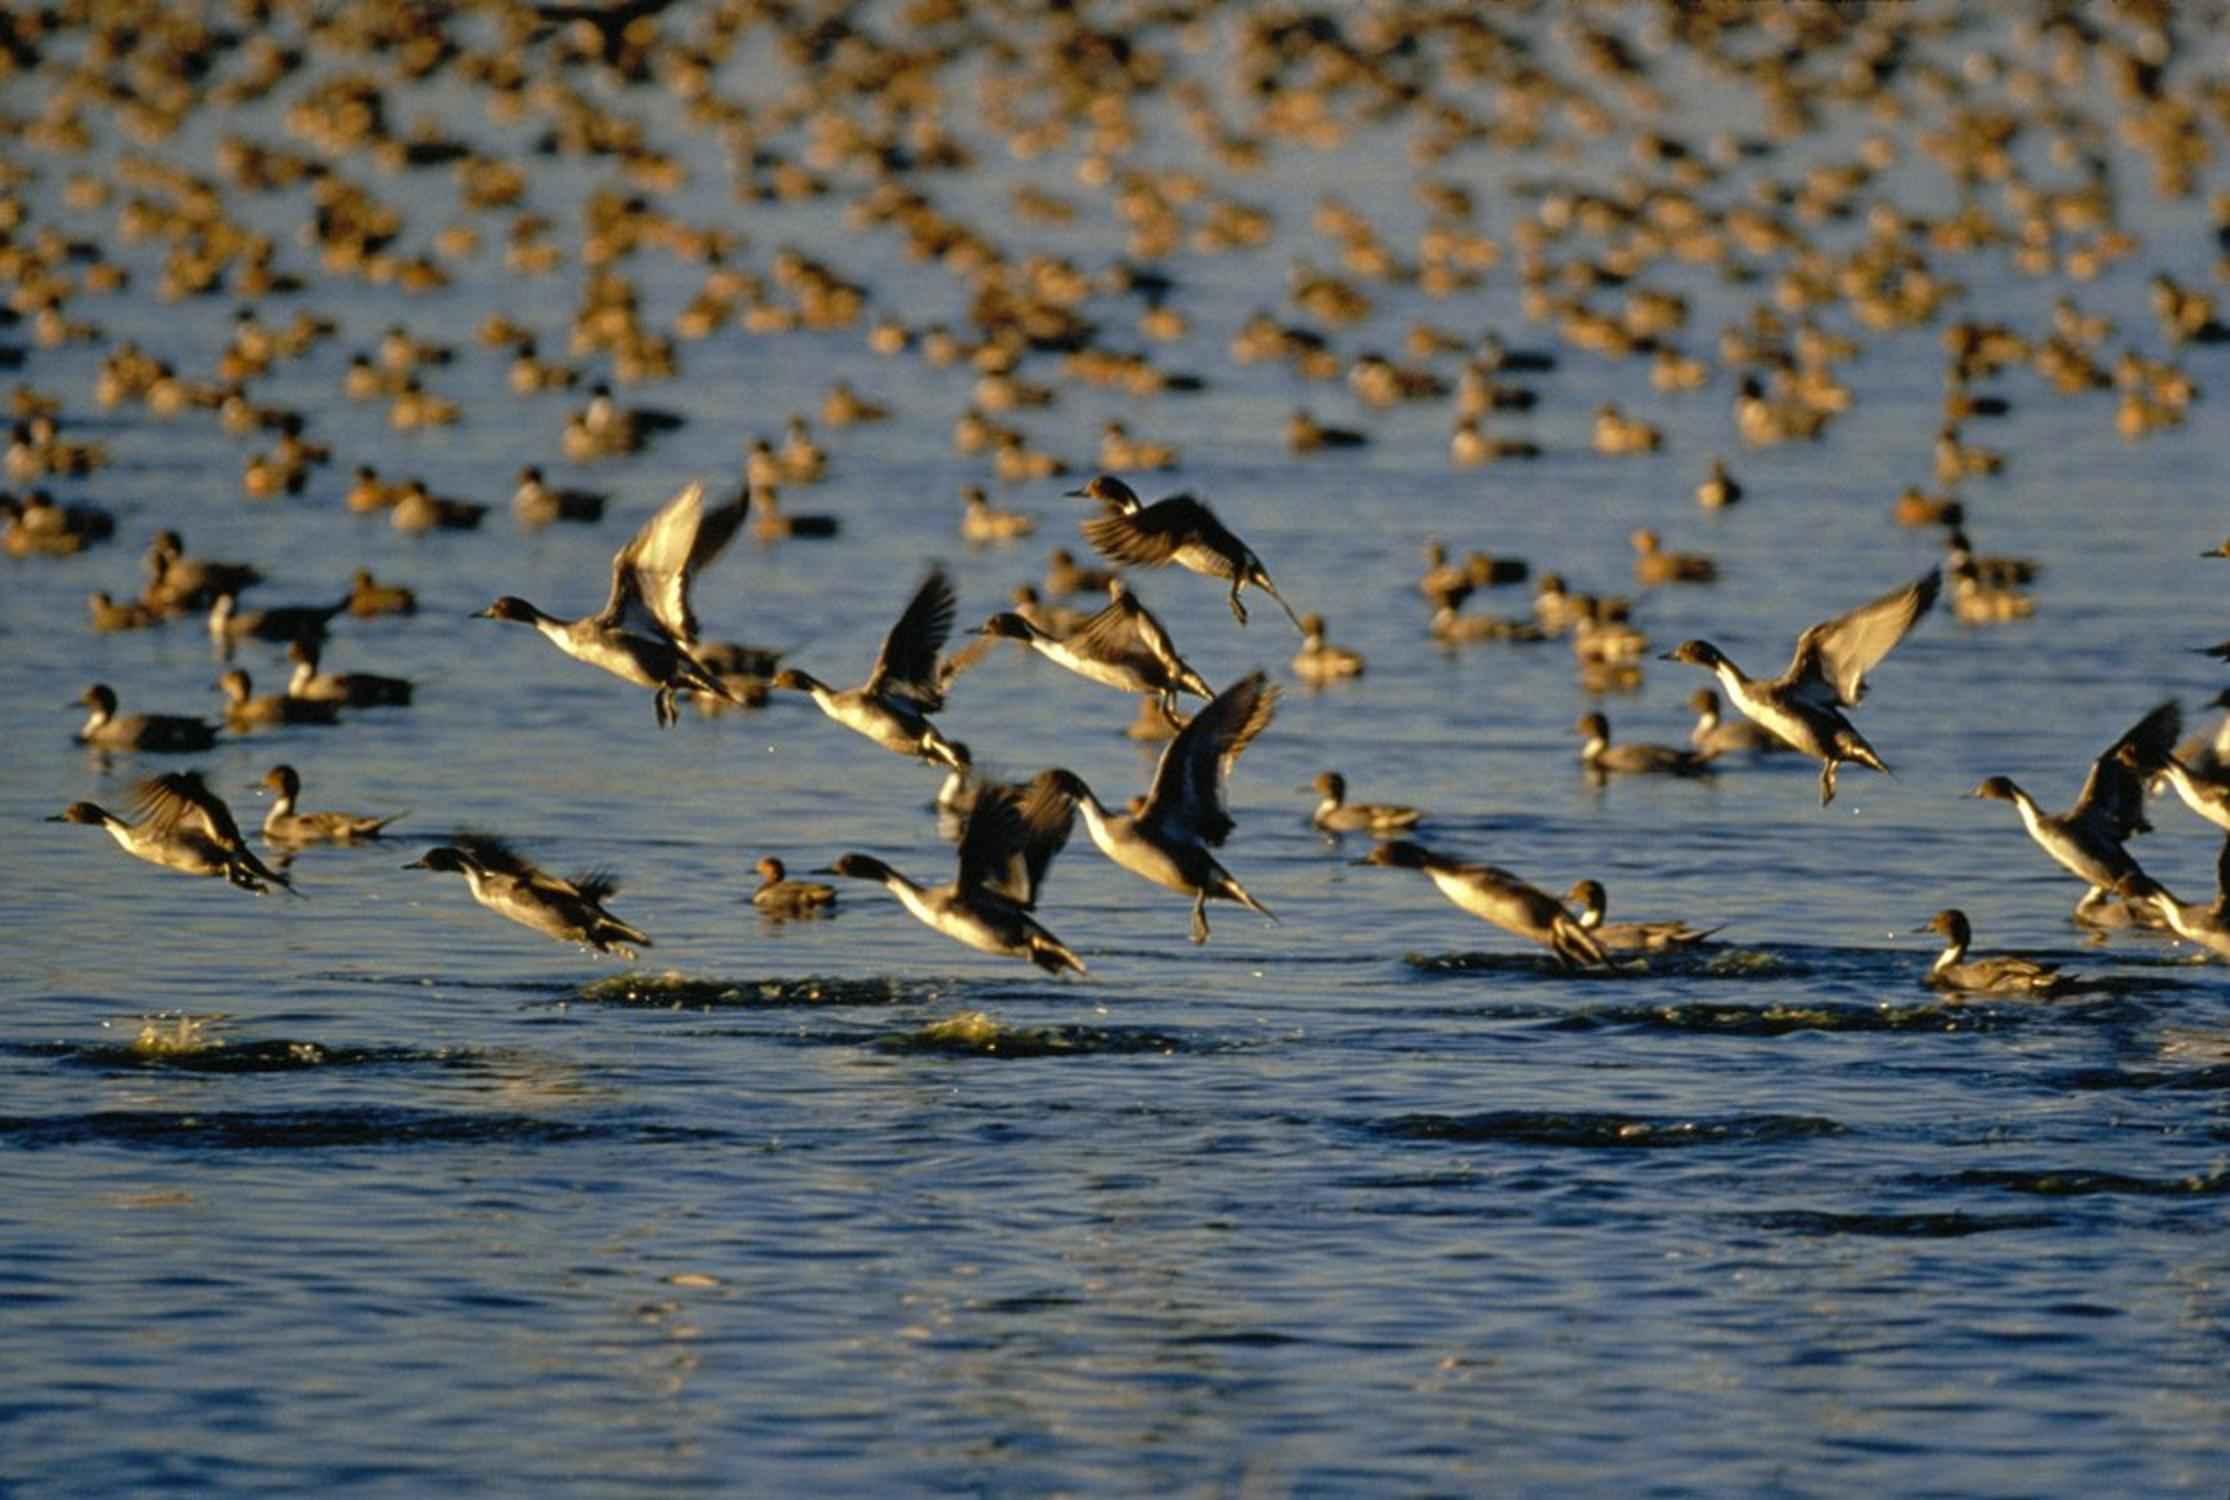 Free picture: wild, ducks, flock, flying, water  Flock